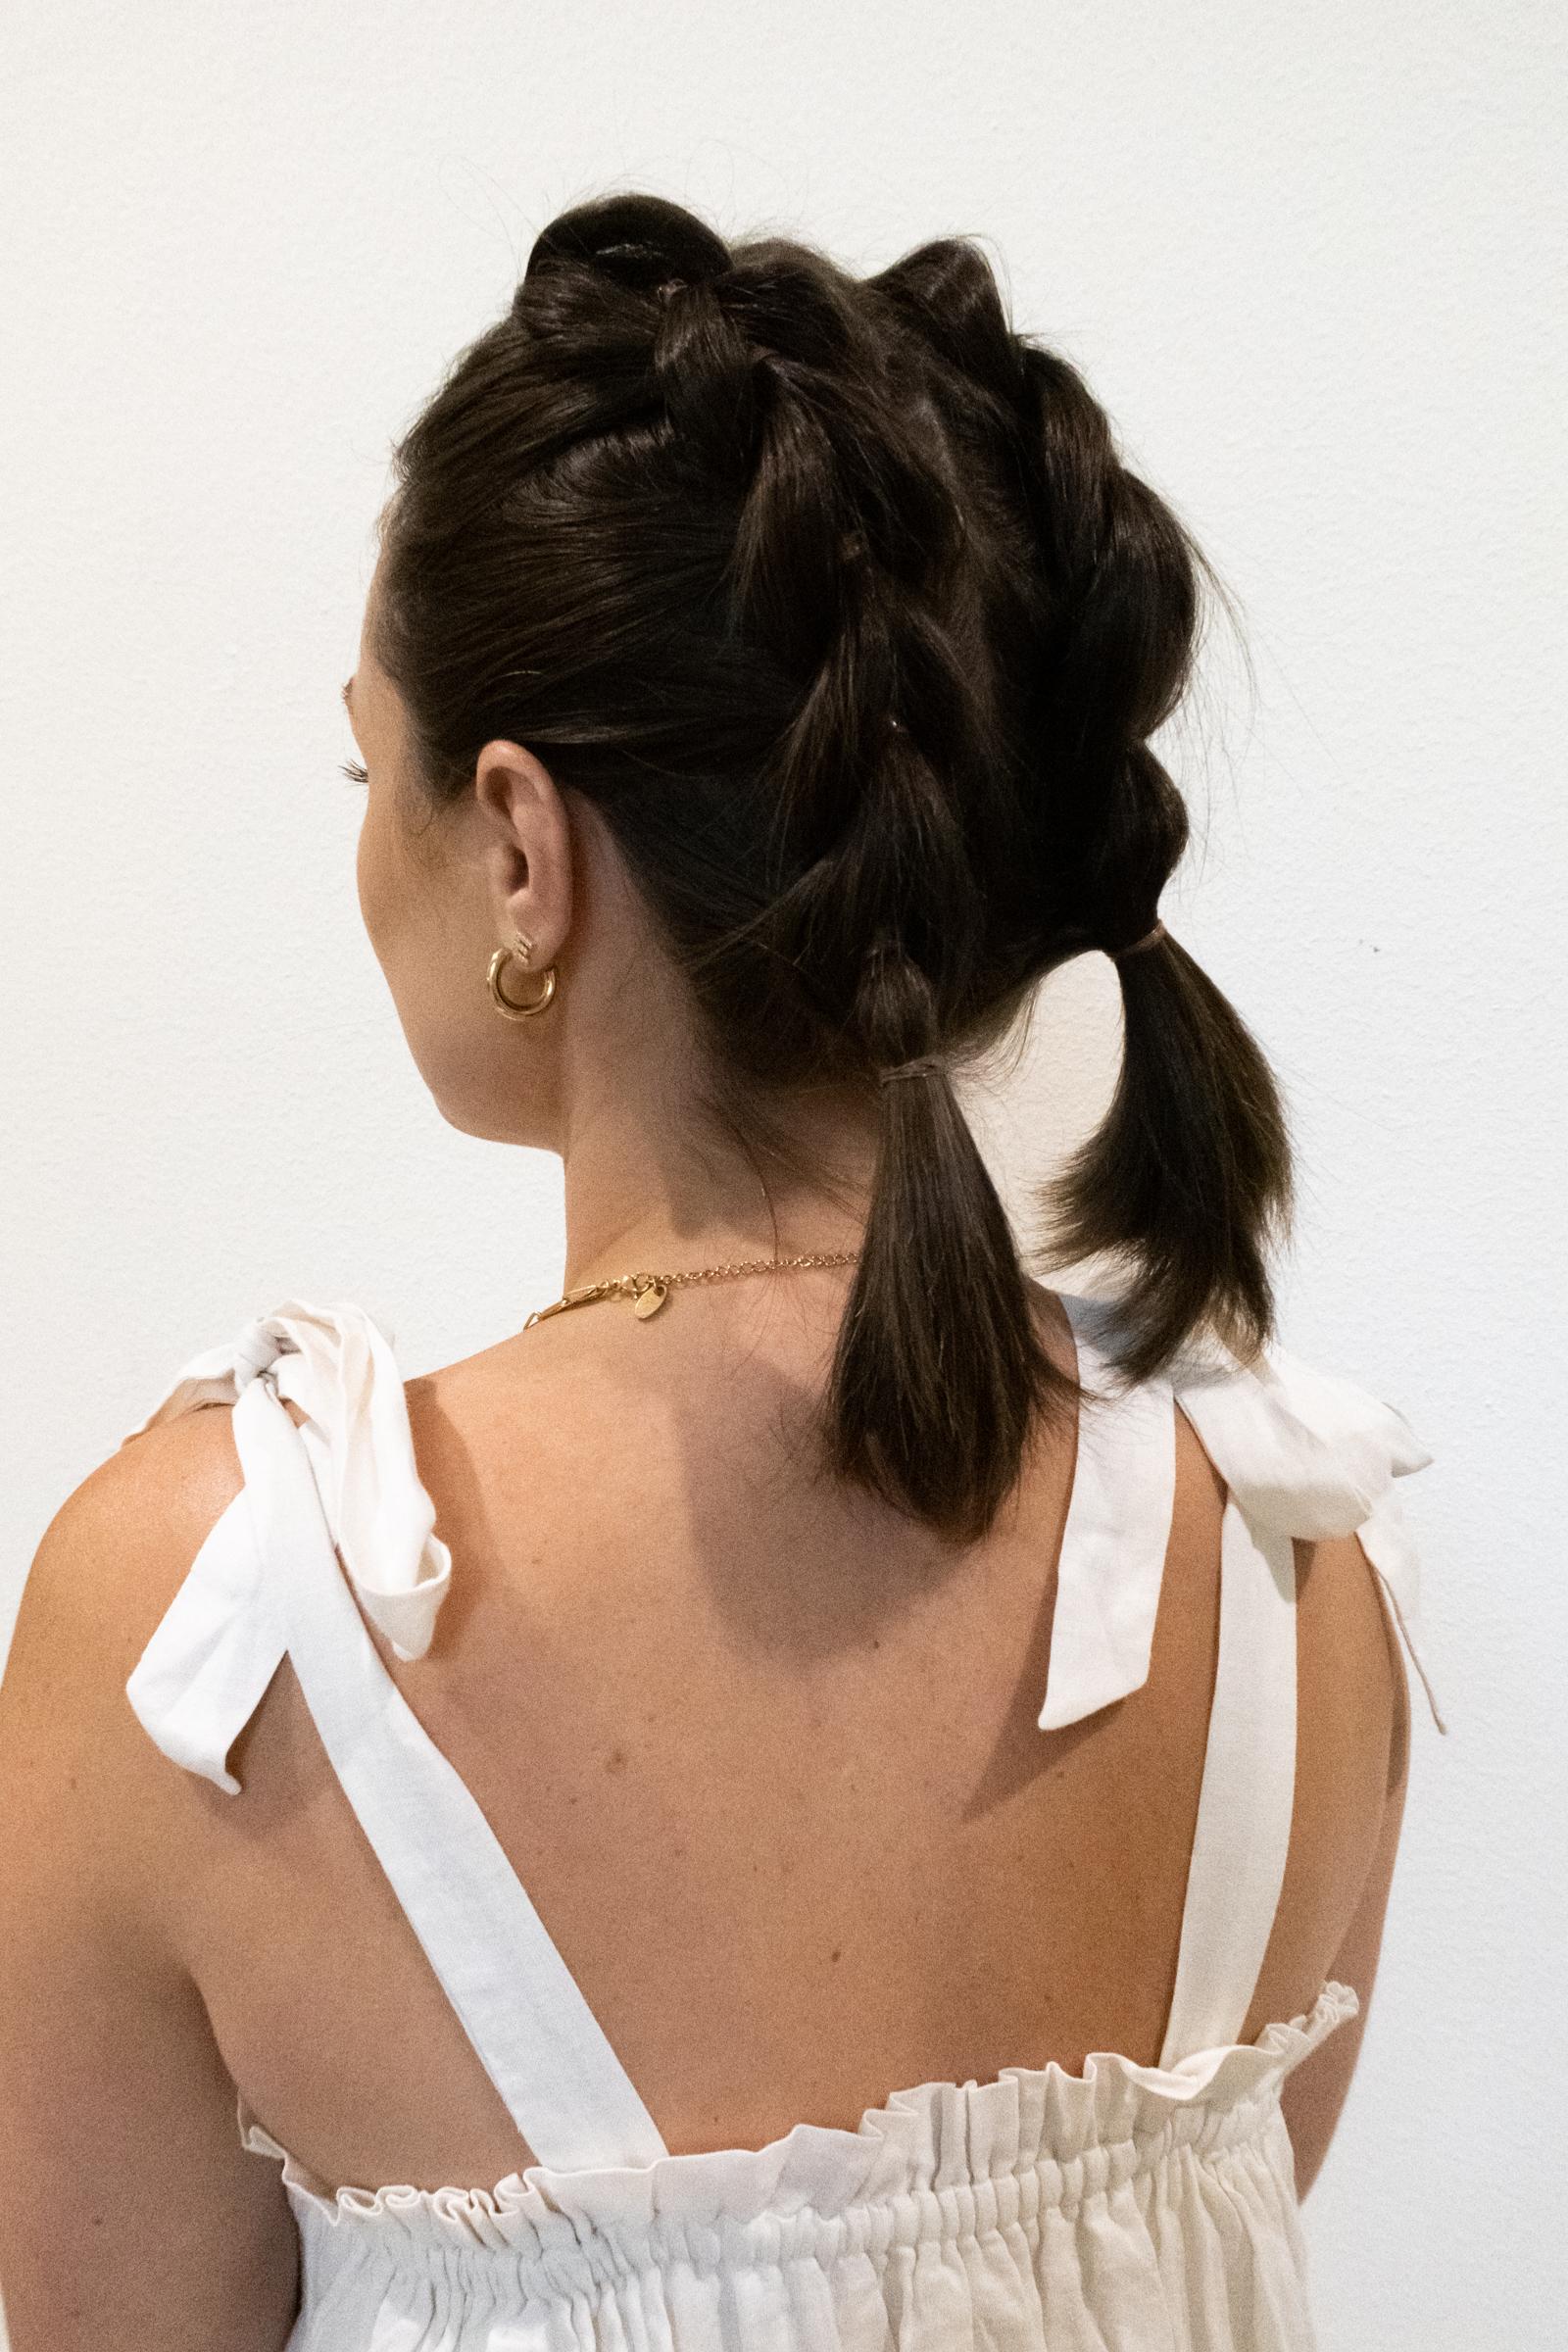 Summer Hairstyles for Short Hair: Elly brown shares how a bubble braid for short hair tutorial!